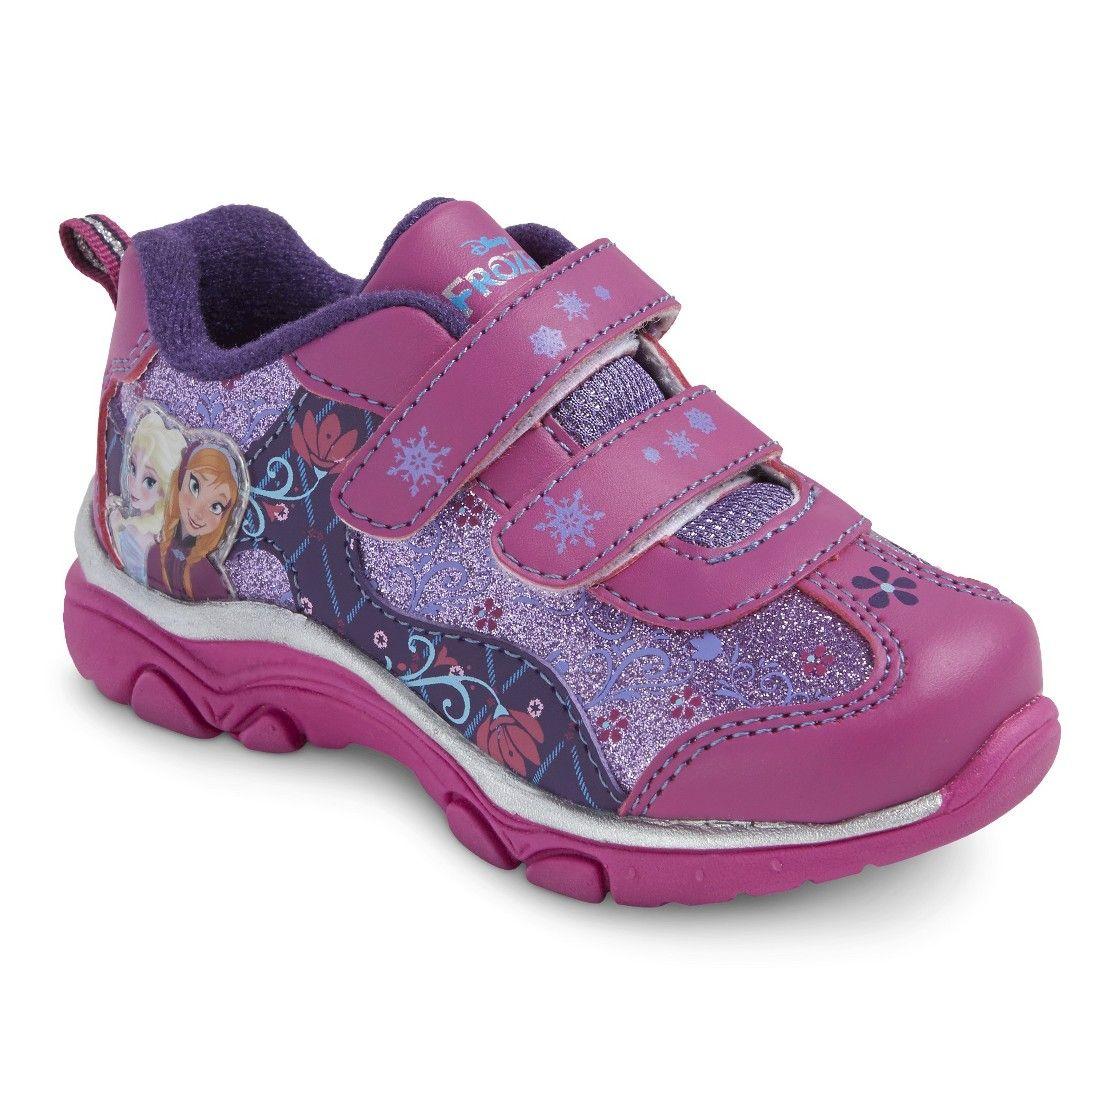 Disney Toddler Girl S Frozen Sneakers Fuchsia Frozen Shoes Disney Toddler Disney Shoes